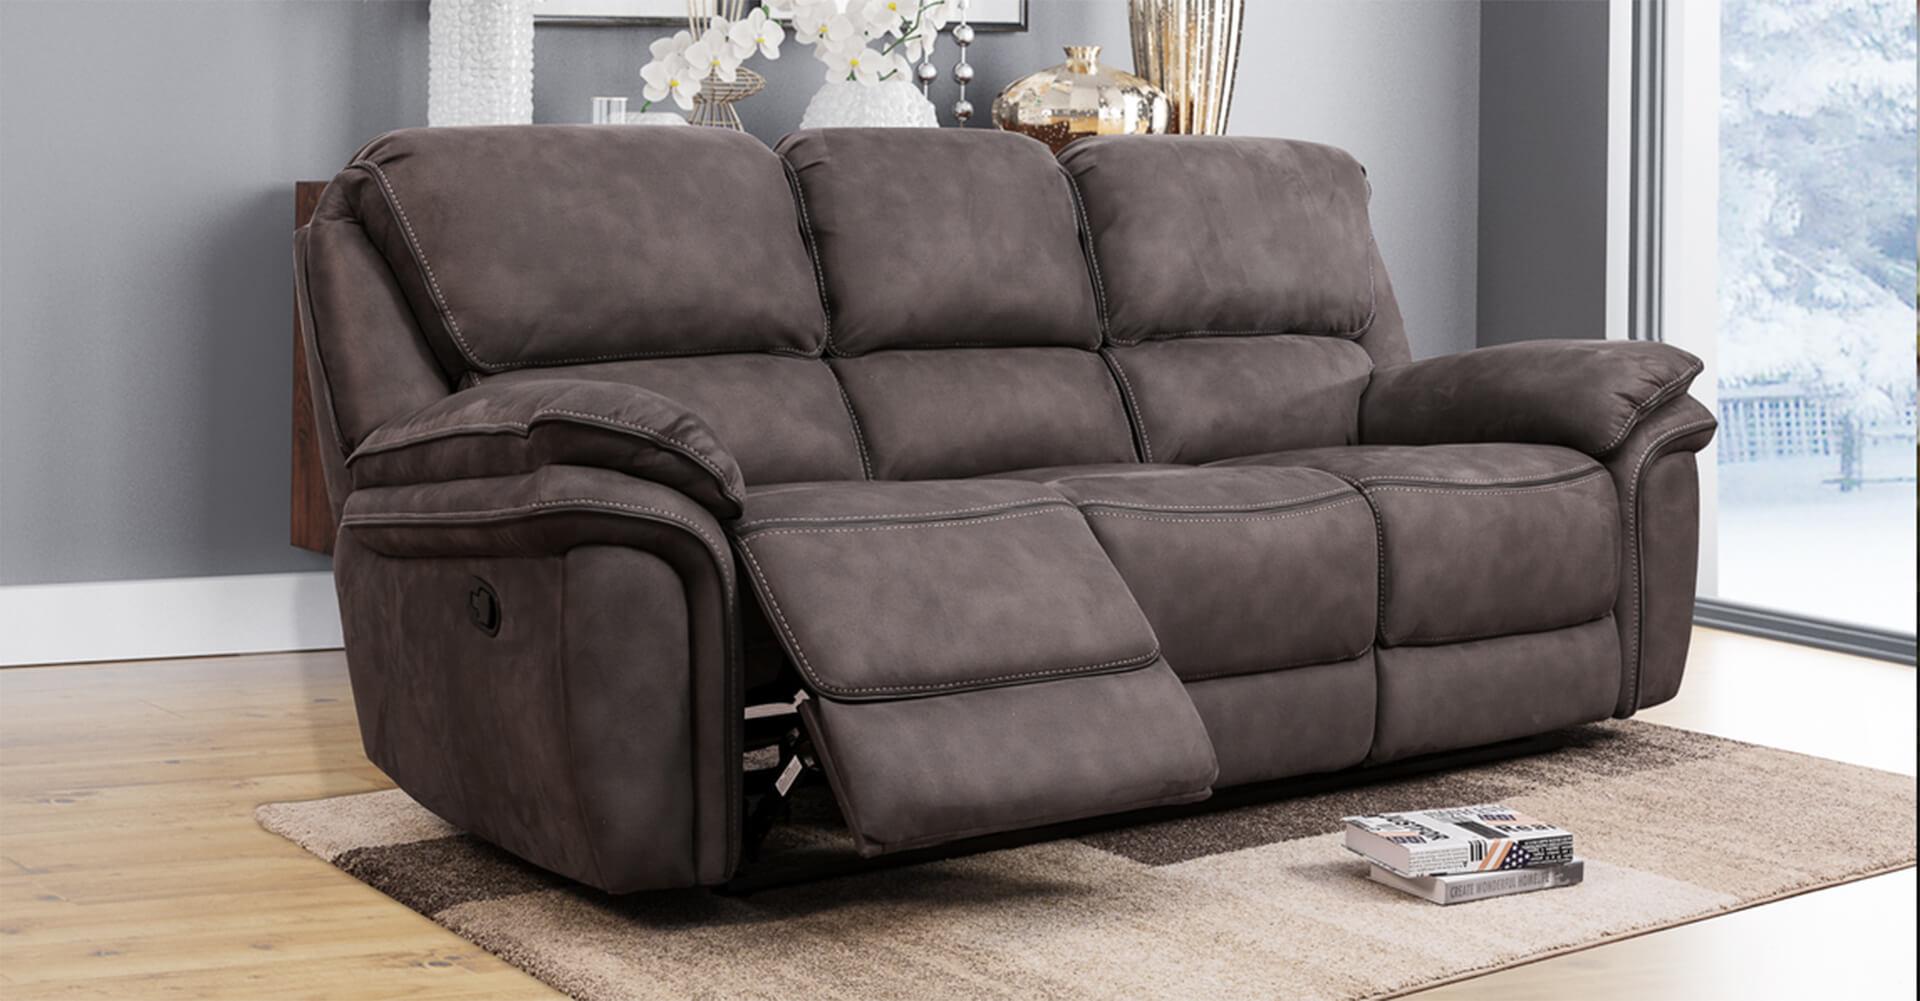 Portland 3 Seater Reclining Sofa - Charcoal